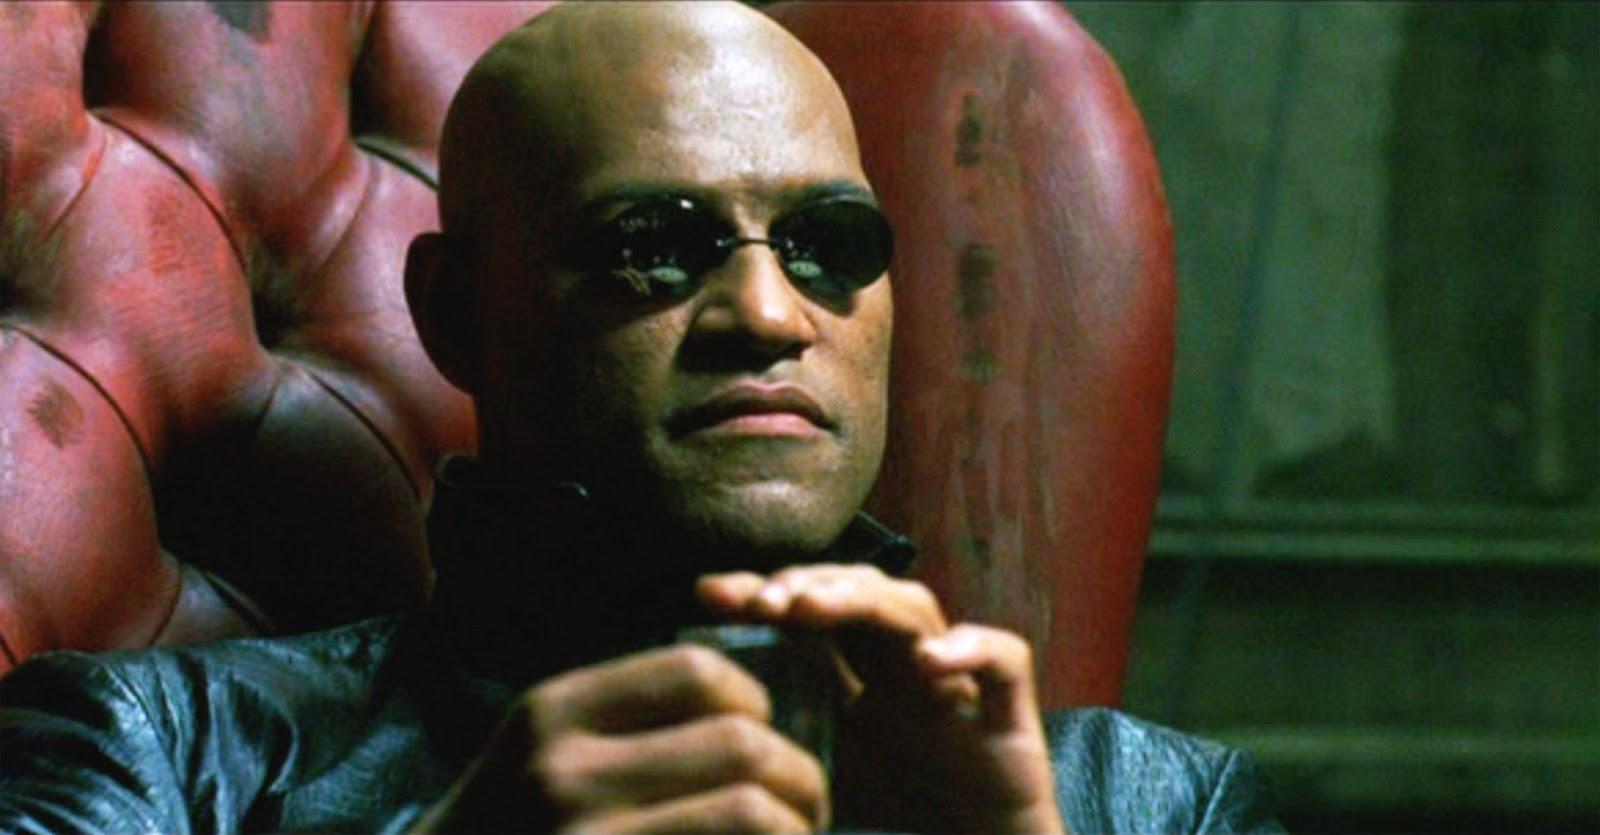 Matrix_morpheus